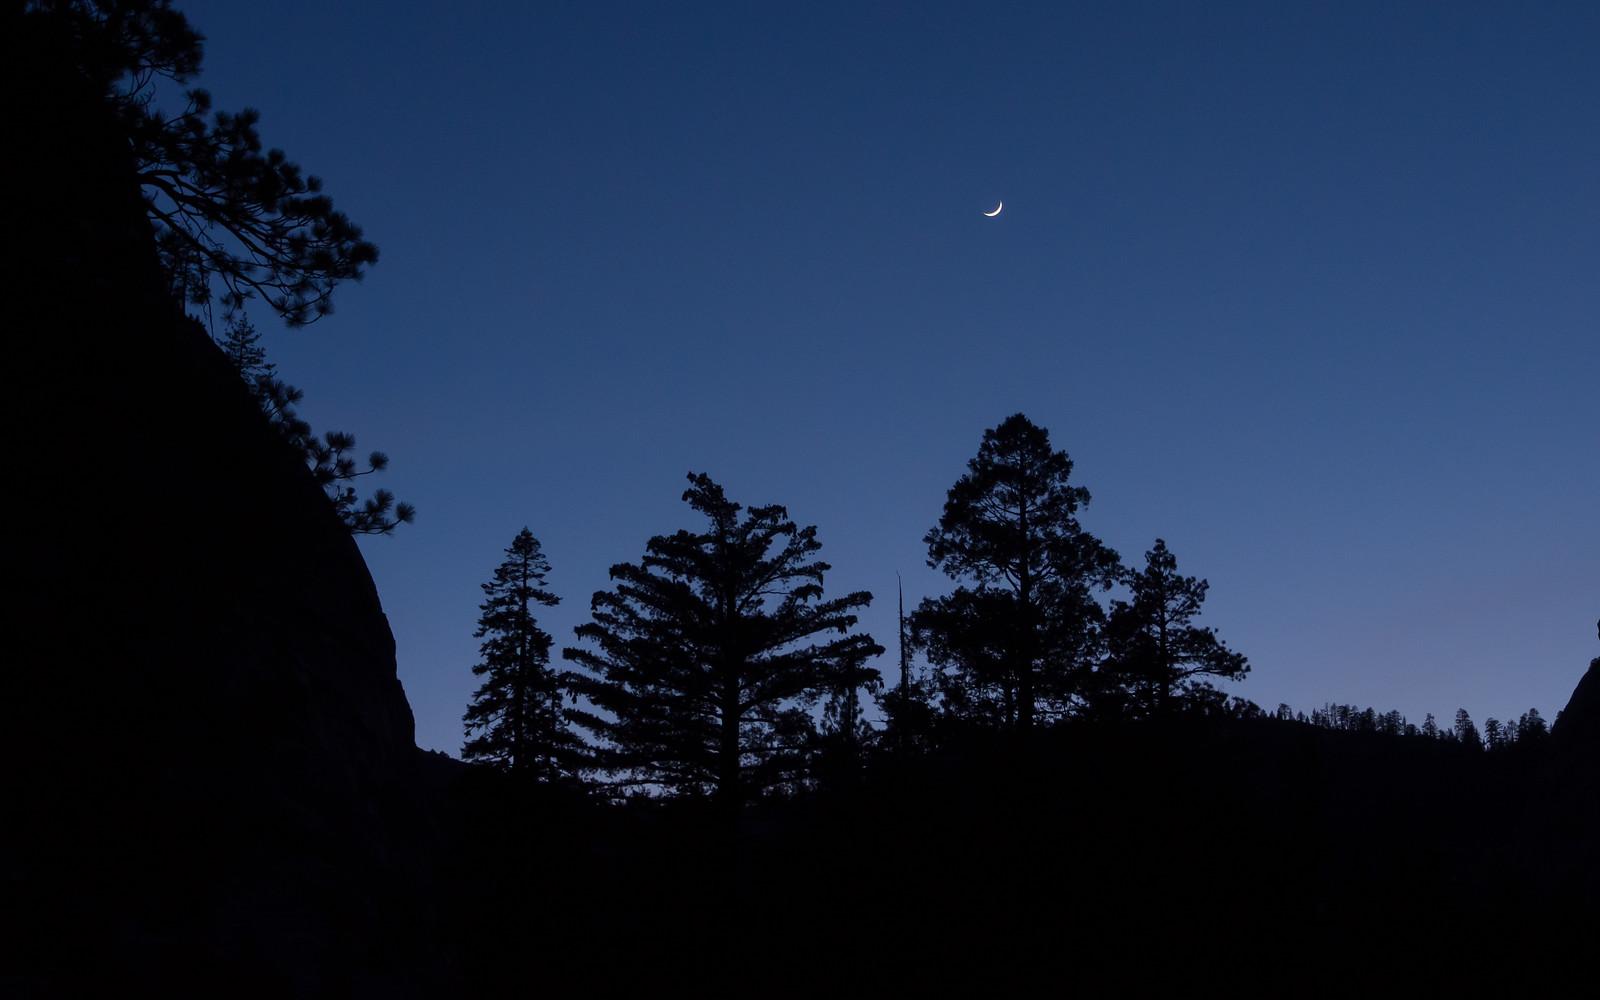 Moon over the Merced River Canyon, Yosemite National Park, USA, May 1, 2014